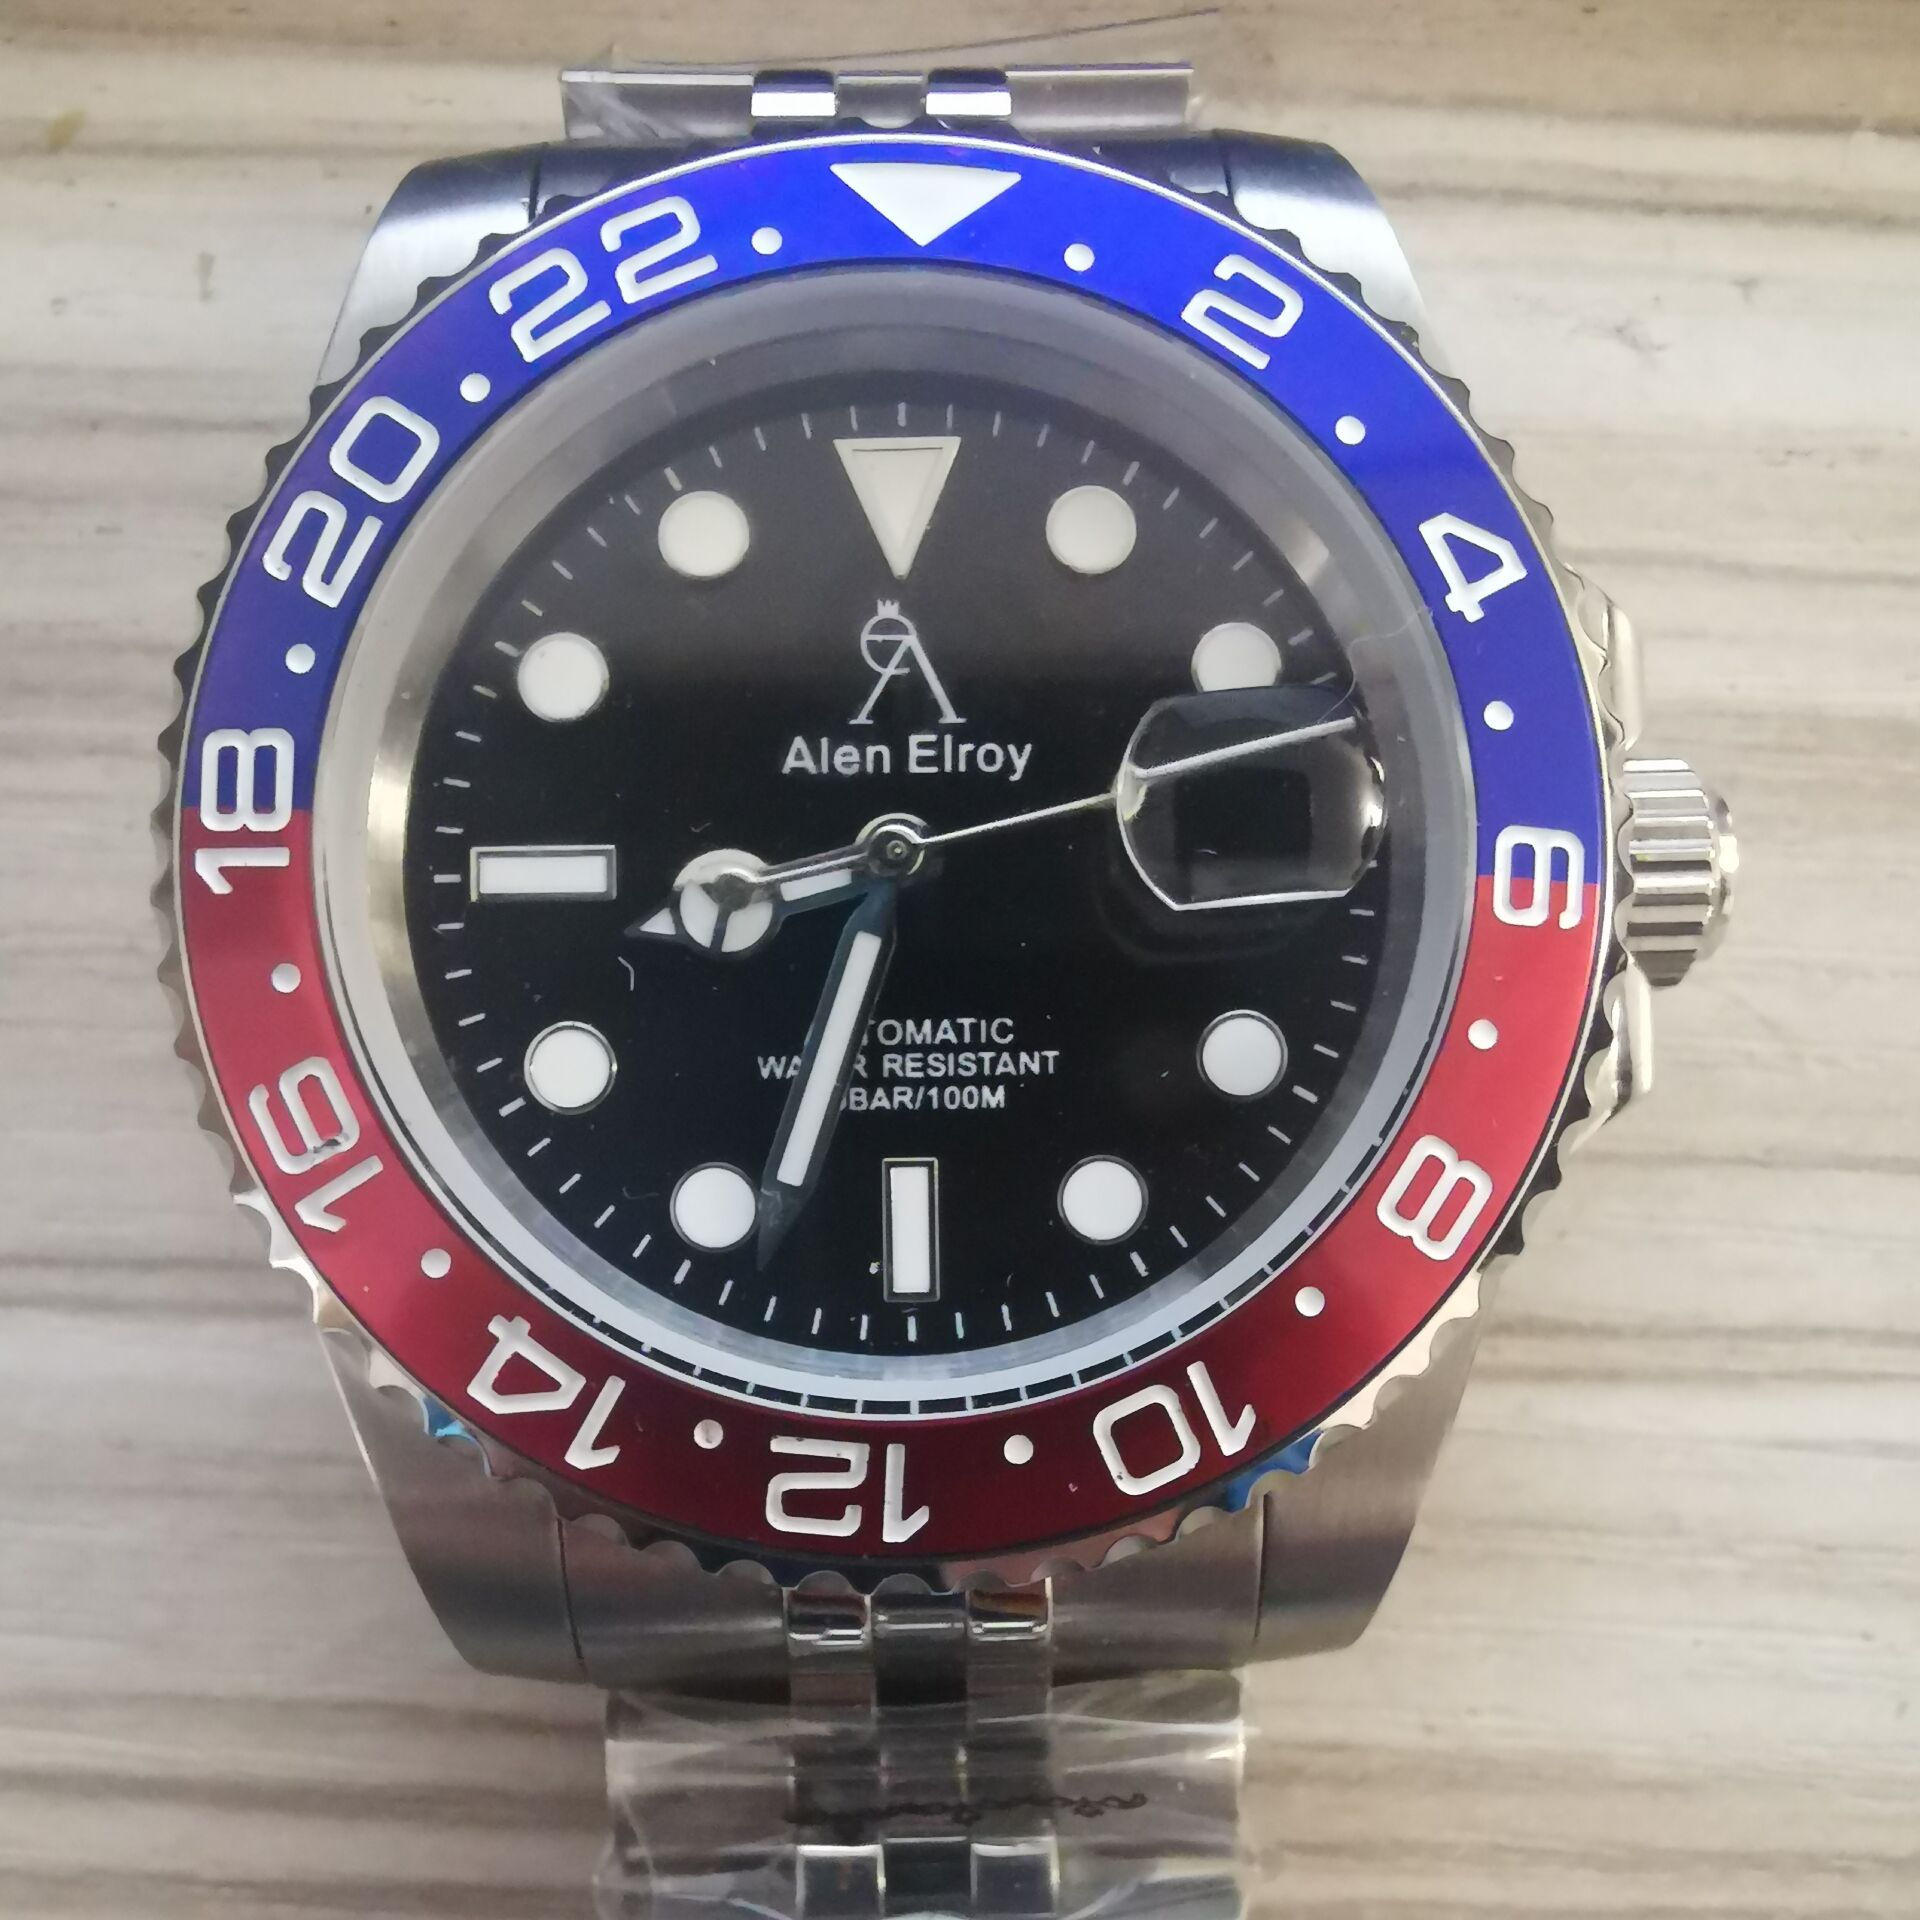 AE High-end watches men's automatic U1 factory ceramic bezel sapphire glass luminous needle sweep movement luxury Black sub